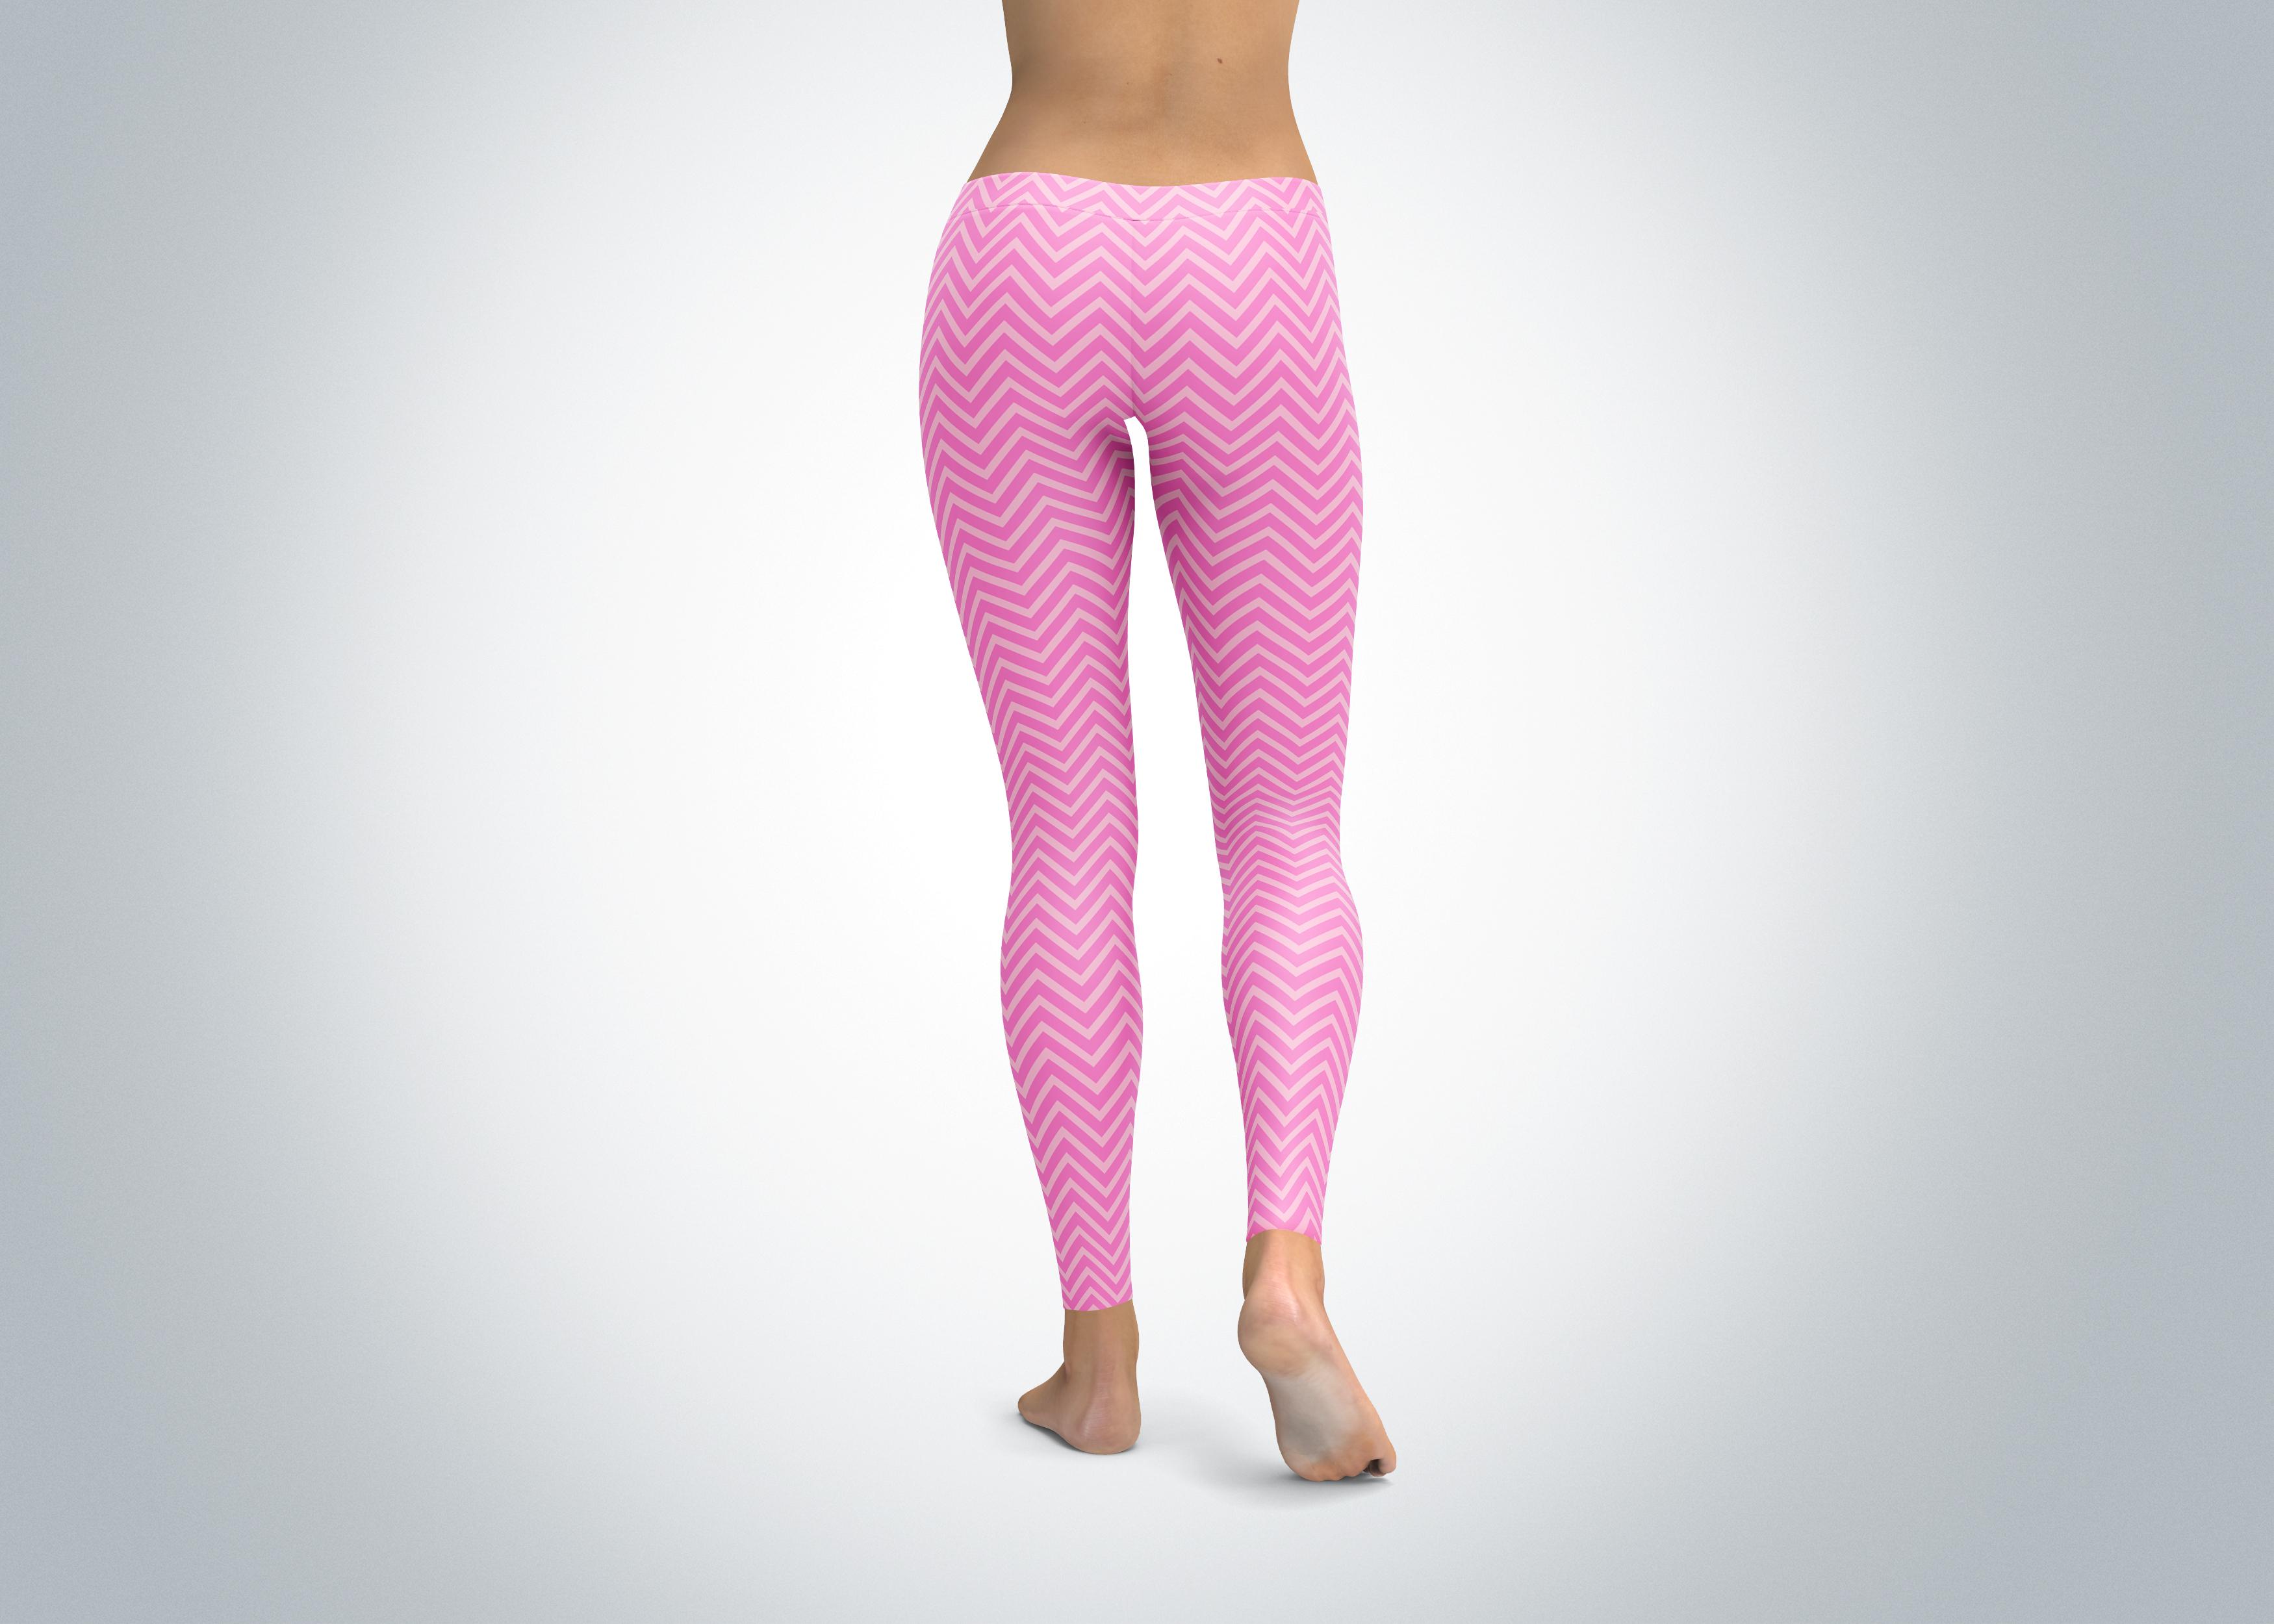 pink chevron yoga pants leggings spirit west designs. Black Bedroom Furniture Sets. Home Design Ideas